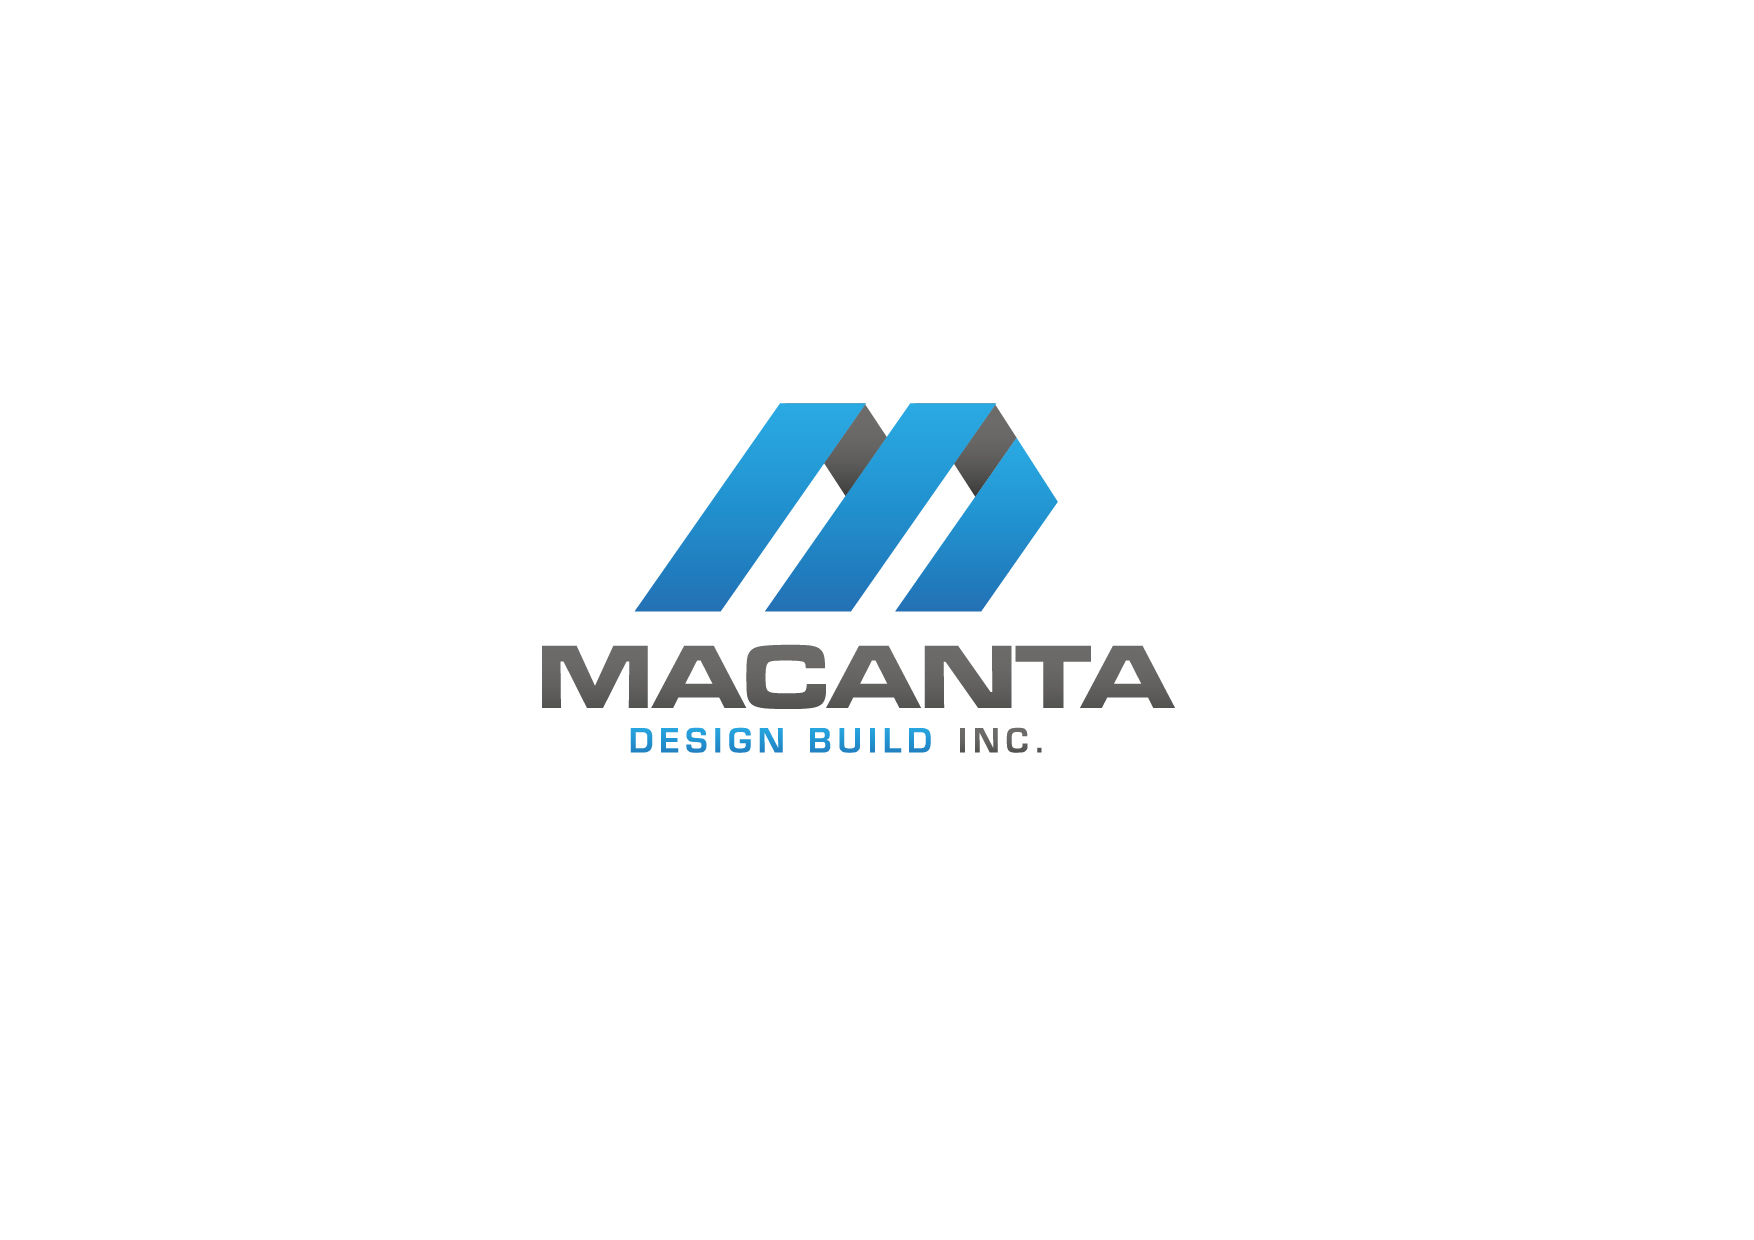 Logo Design by Cutris Lotter - Entry No. 86 in the Logo Design Contest Captivating Logo Design for Macanta Design Build Inc.